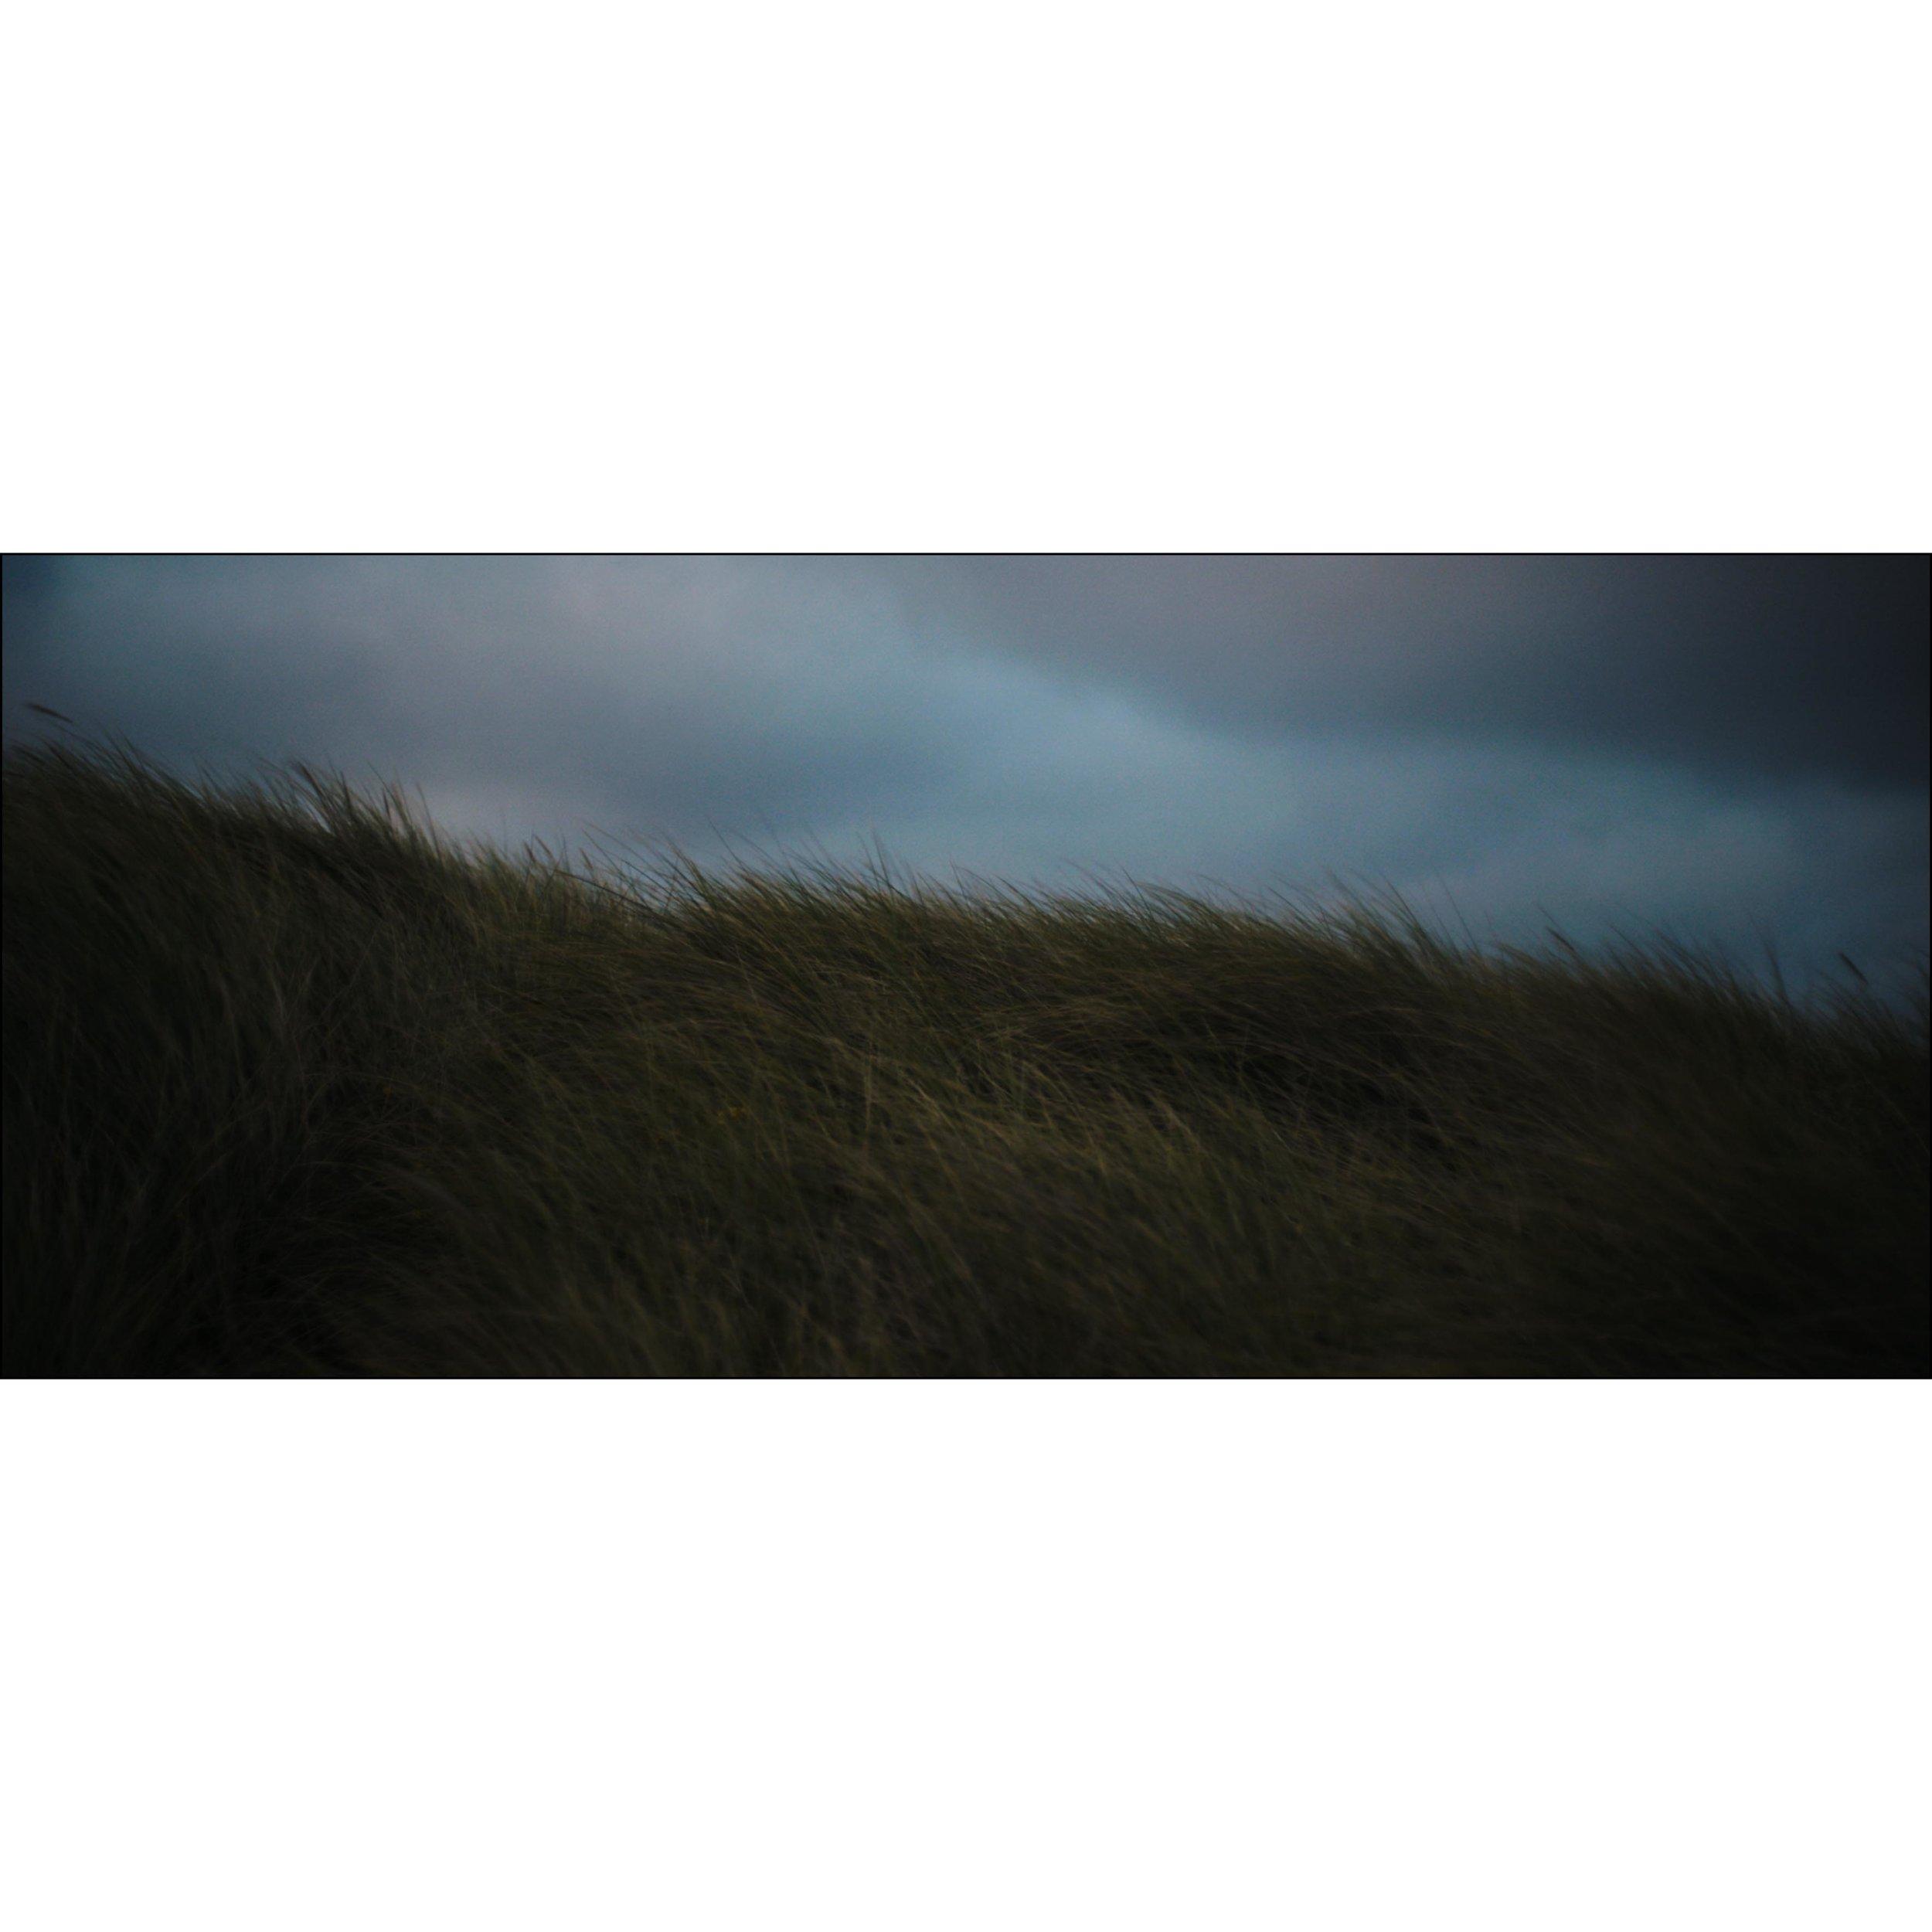 Calais Instagram 1-1-3.jpg